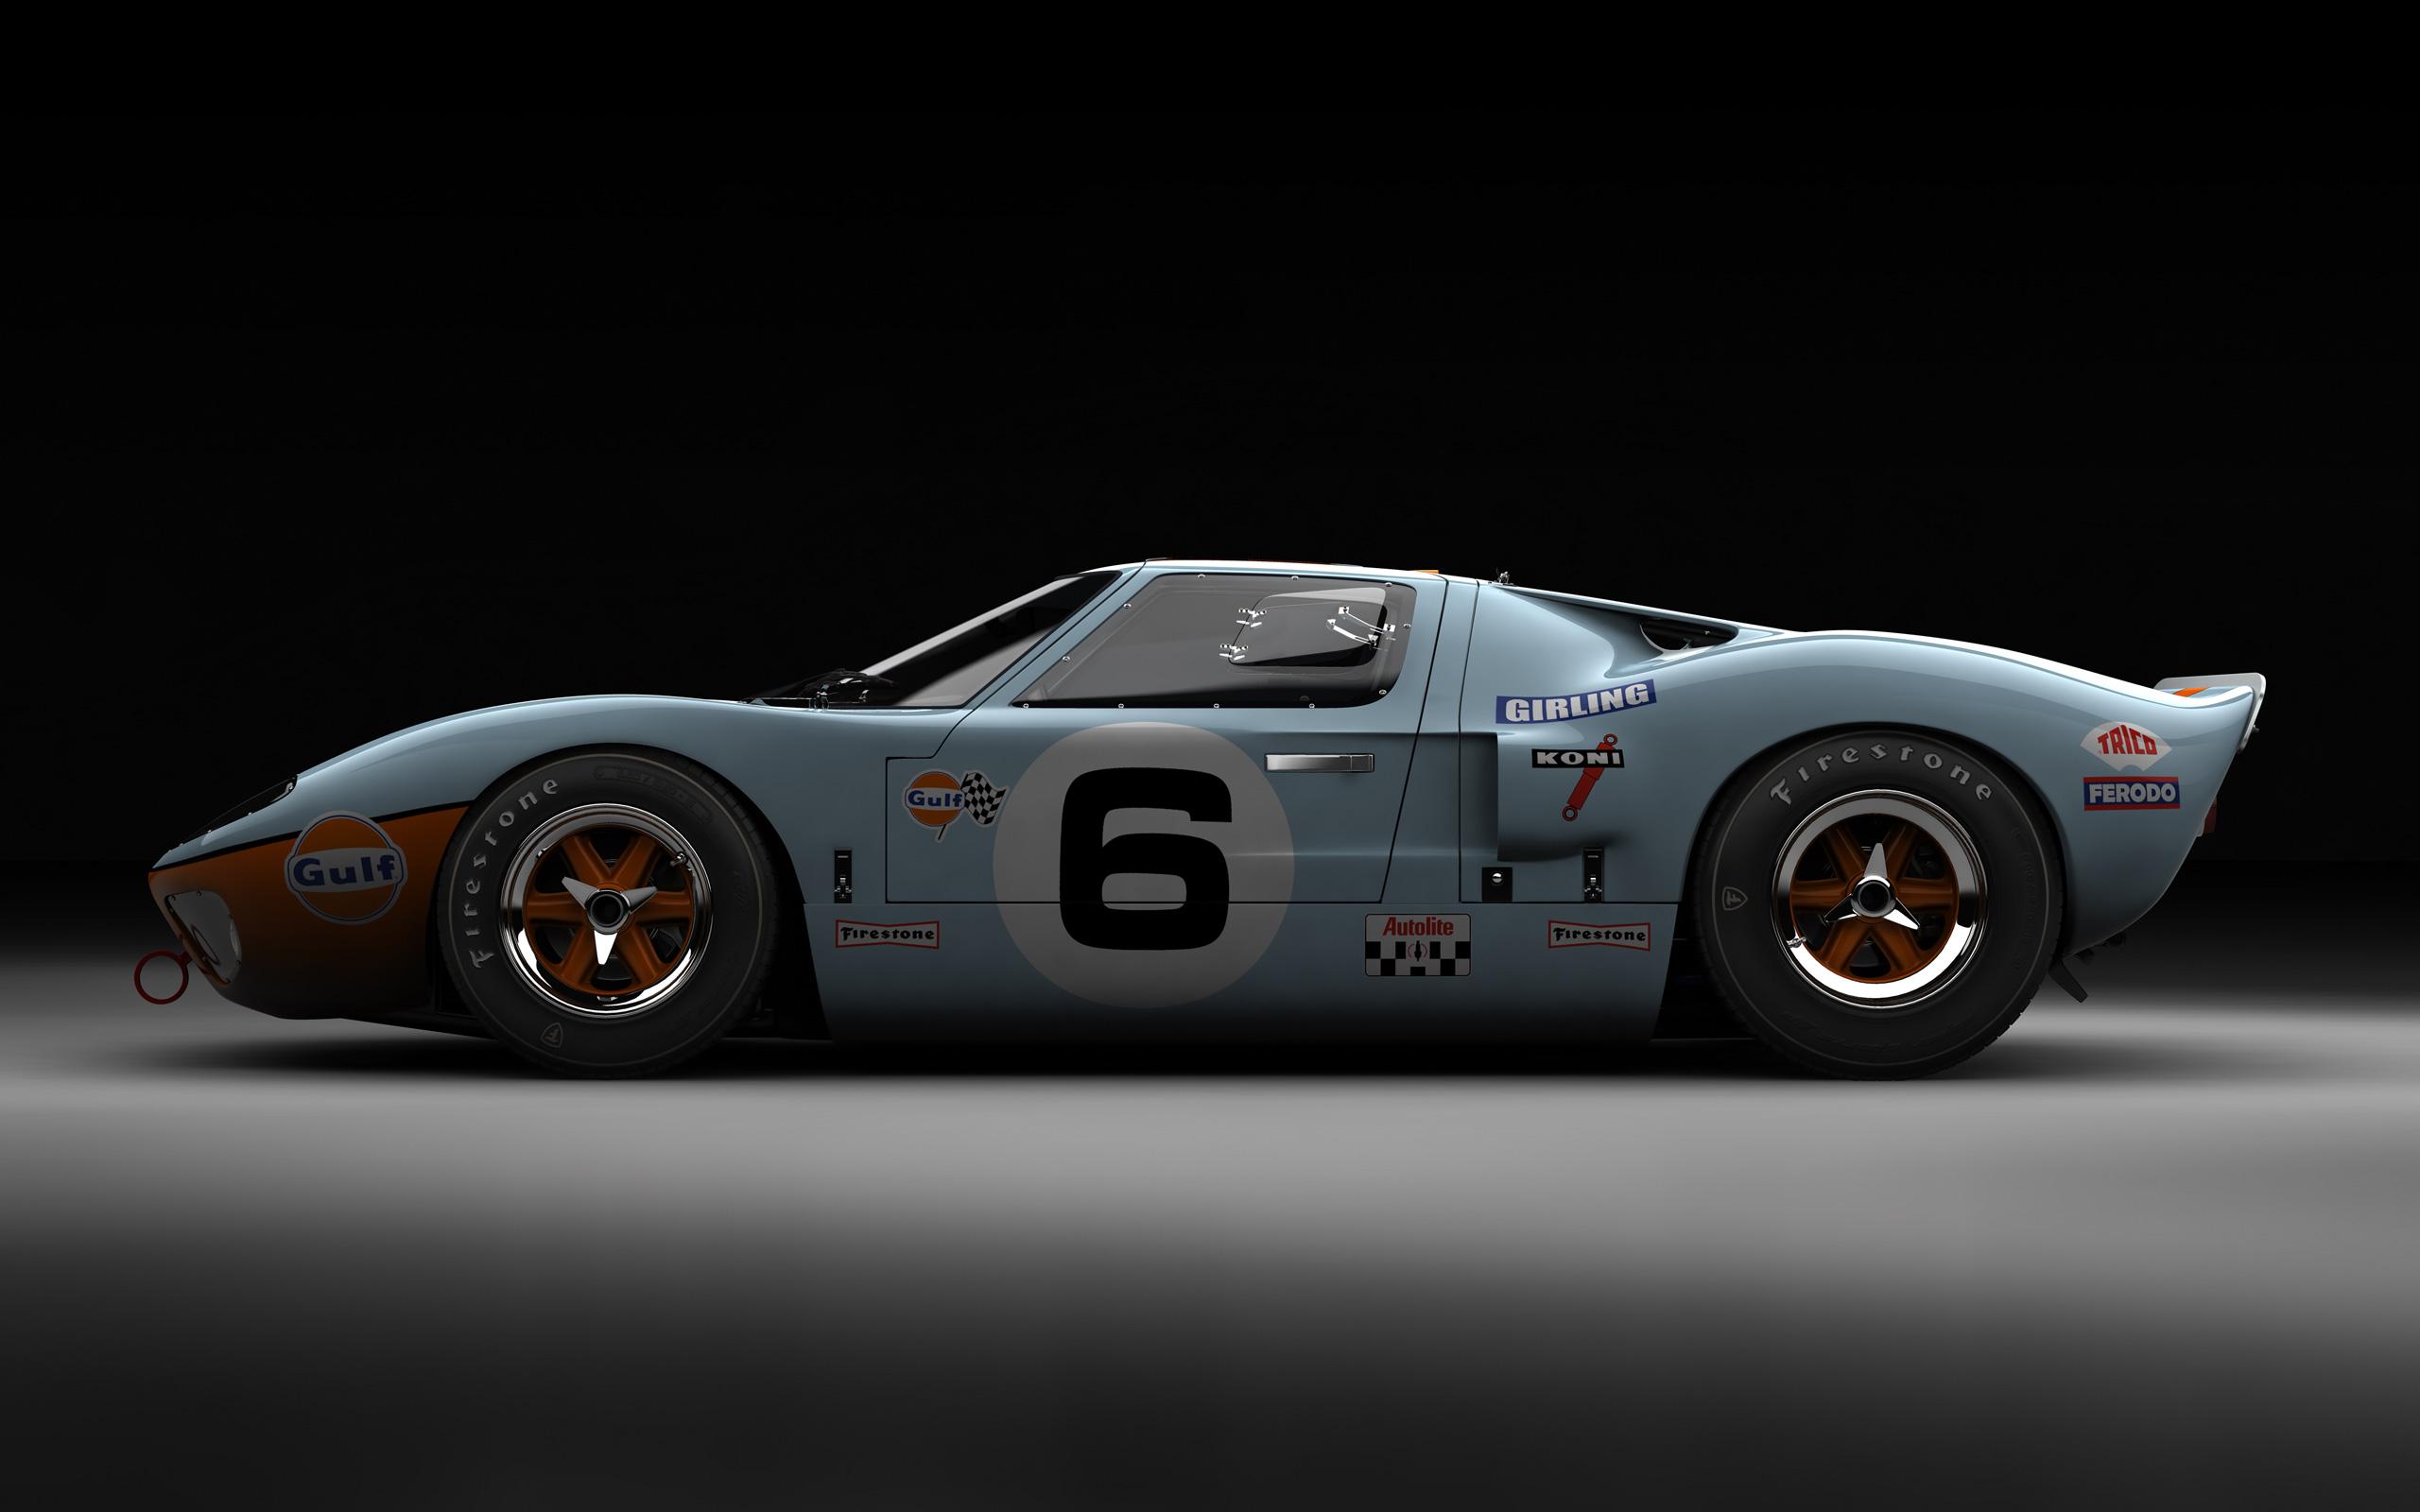 Cars   Ford GT40 Mark I Gulf LeMans 1969   Desktop 2560x1600